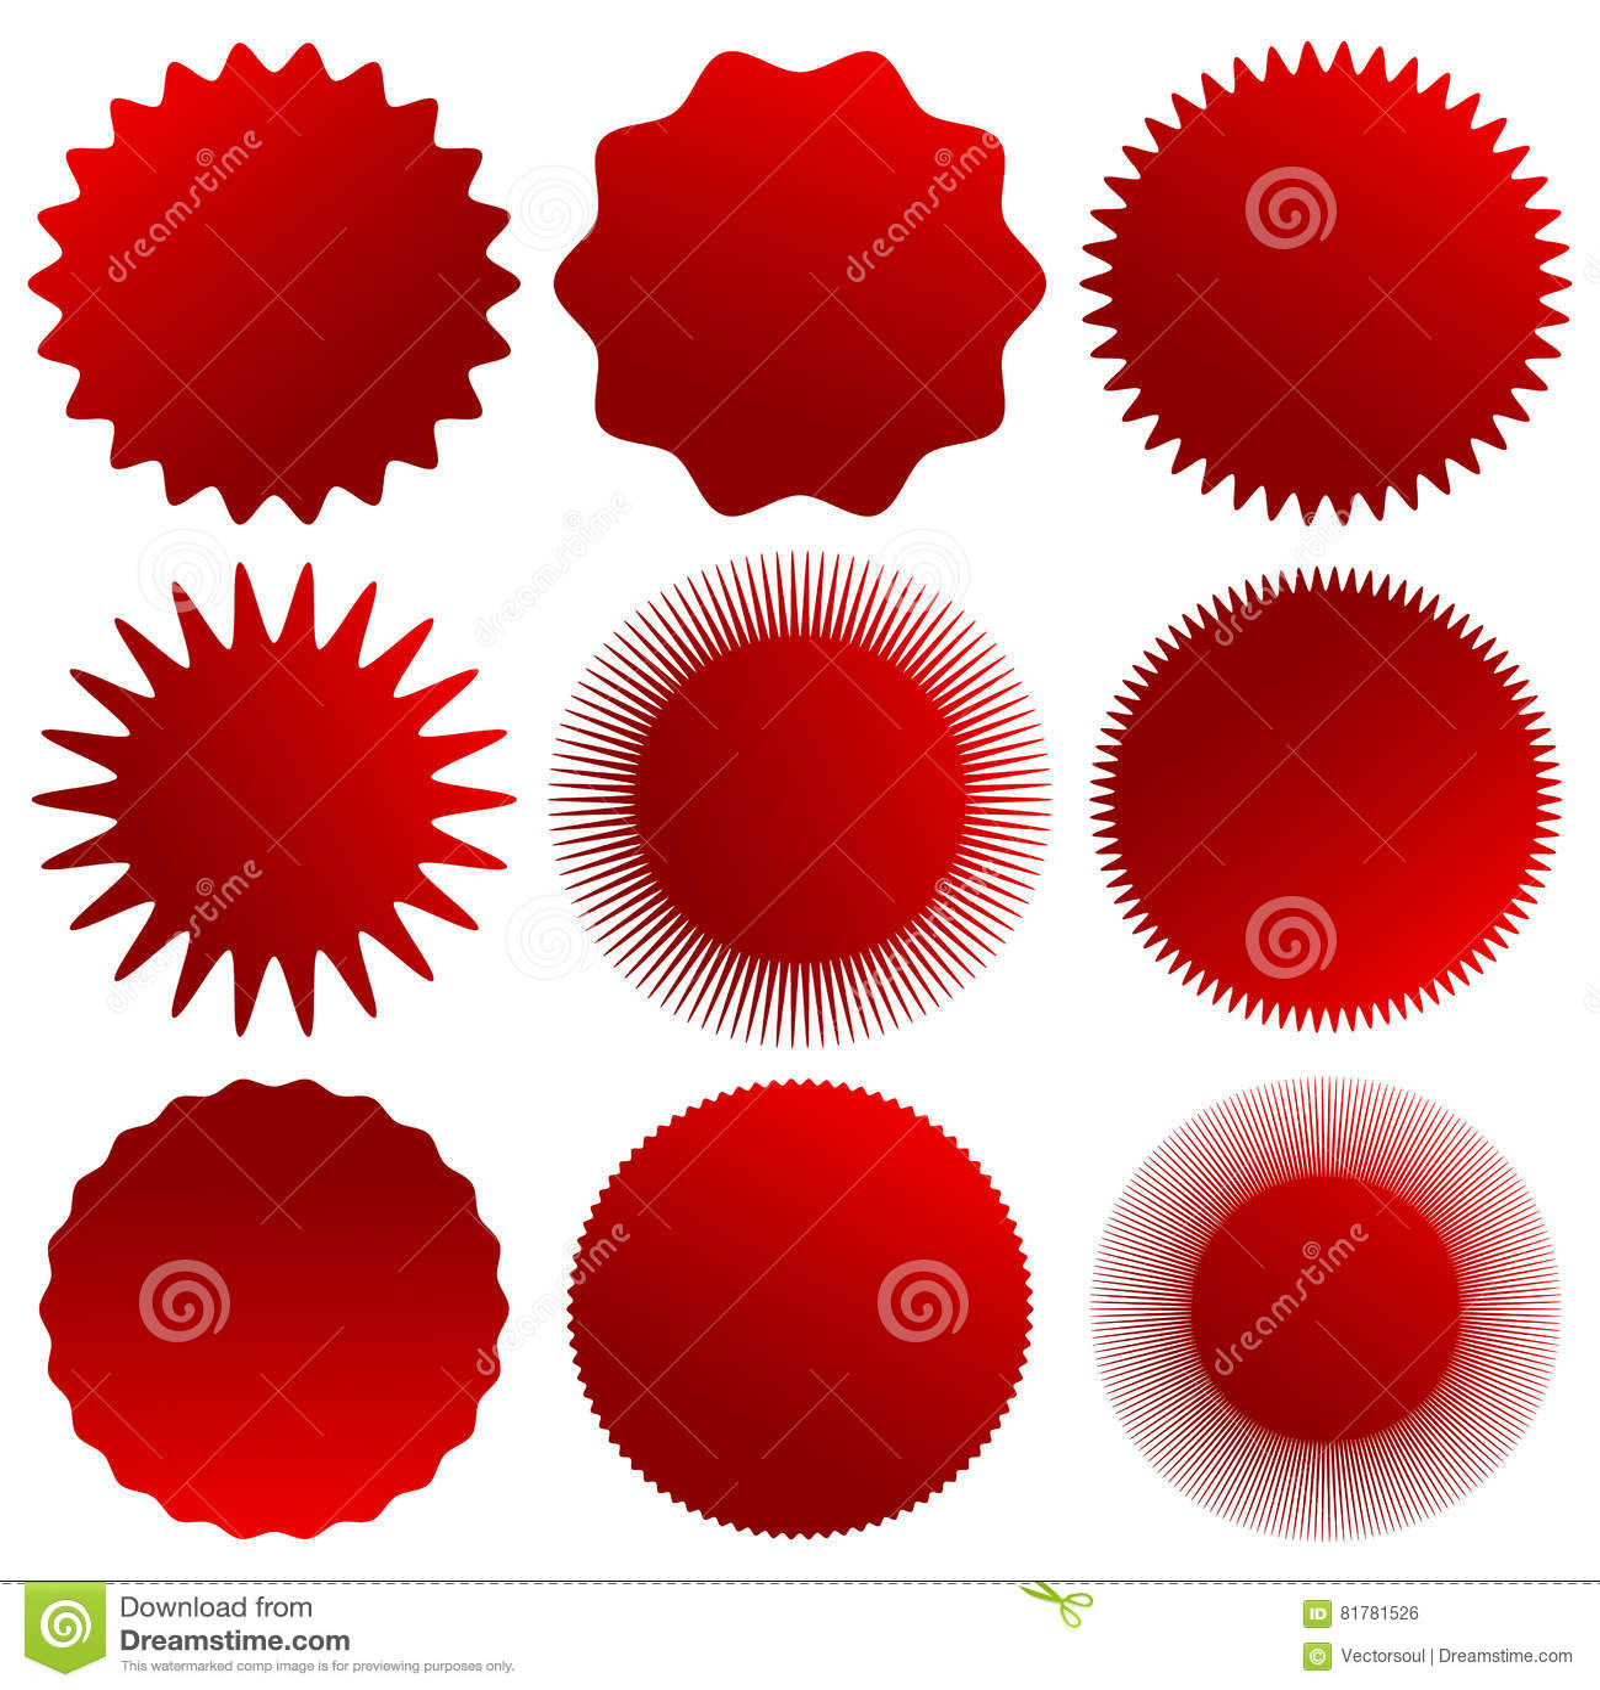 Starburst, Sunburst, Badge Shapes  Set Of 9 Version Stock Vector